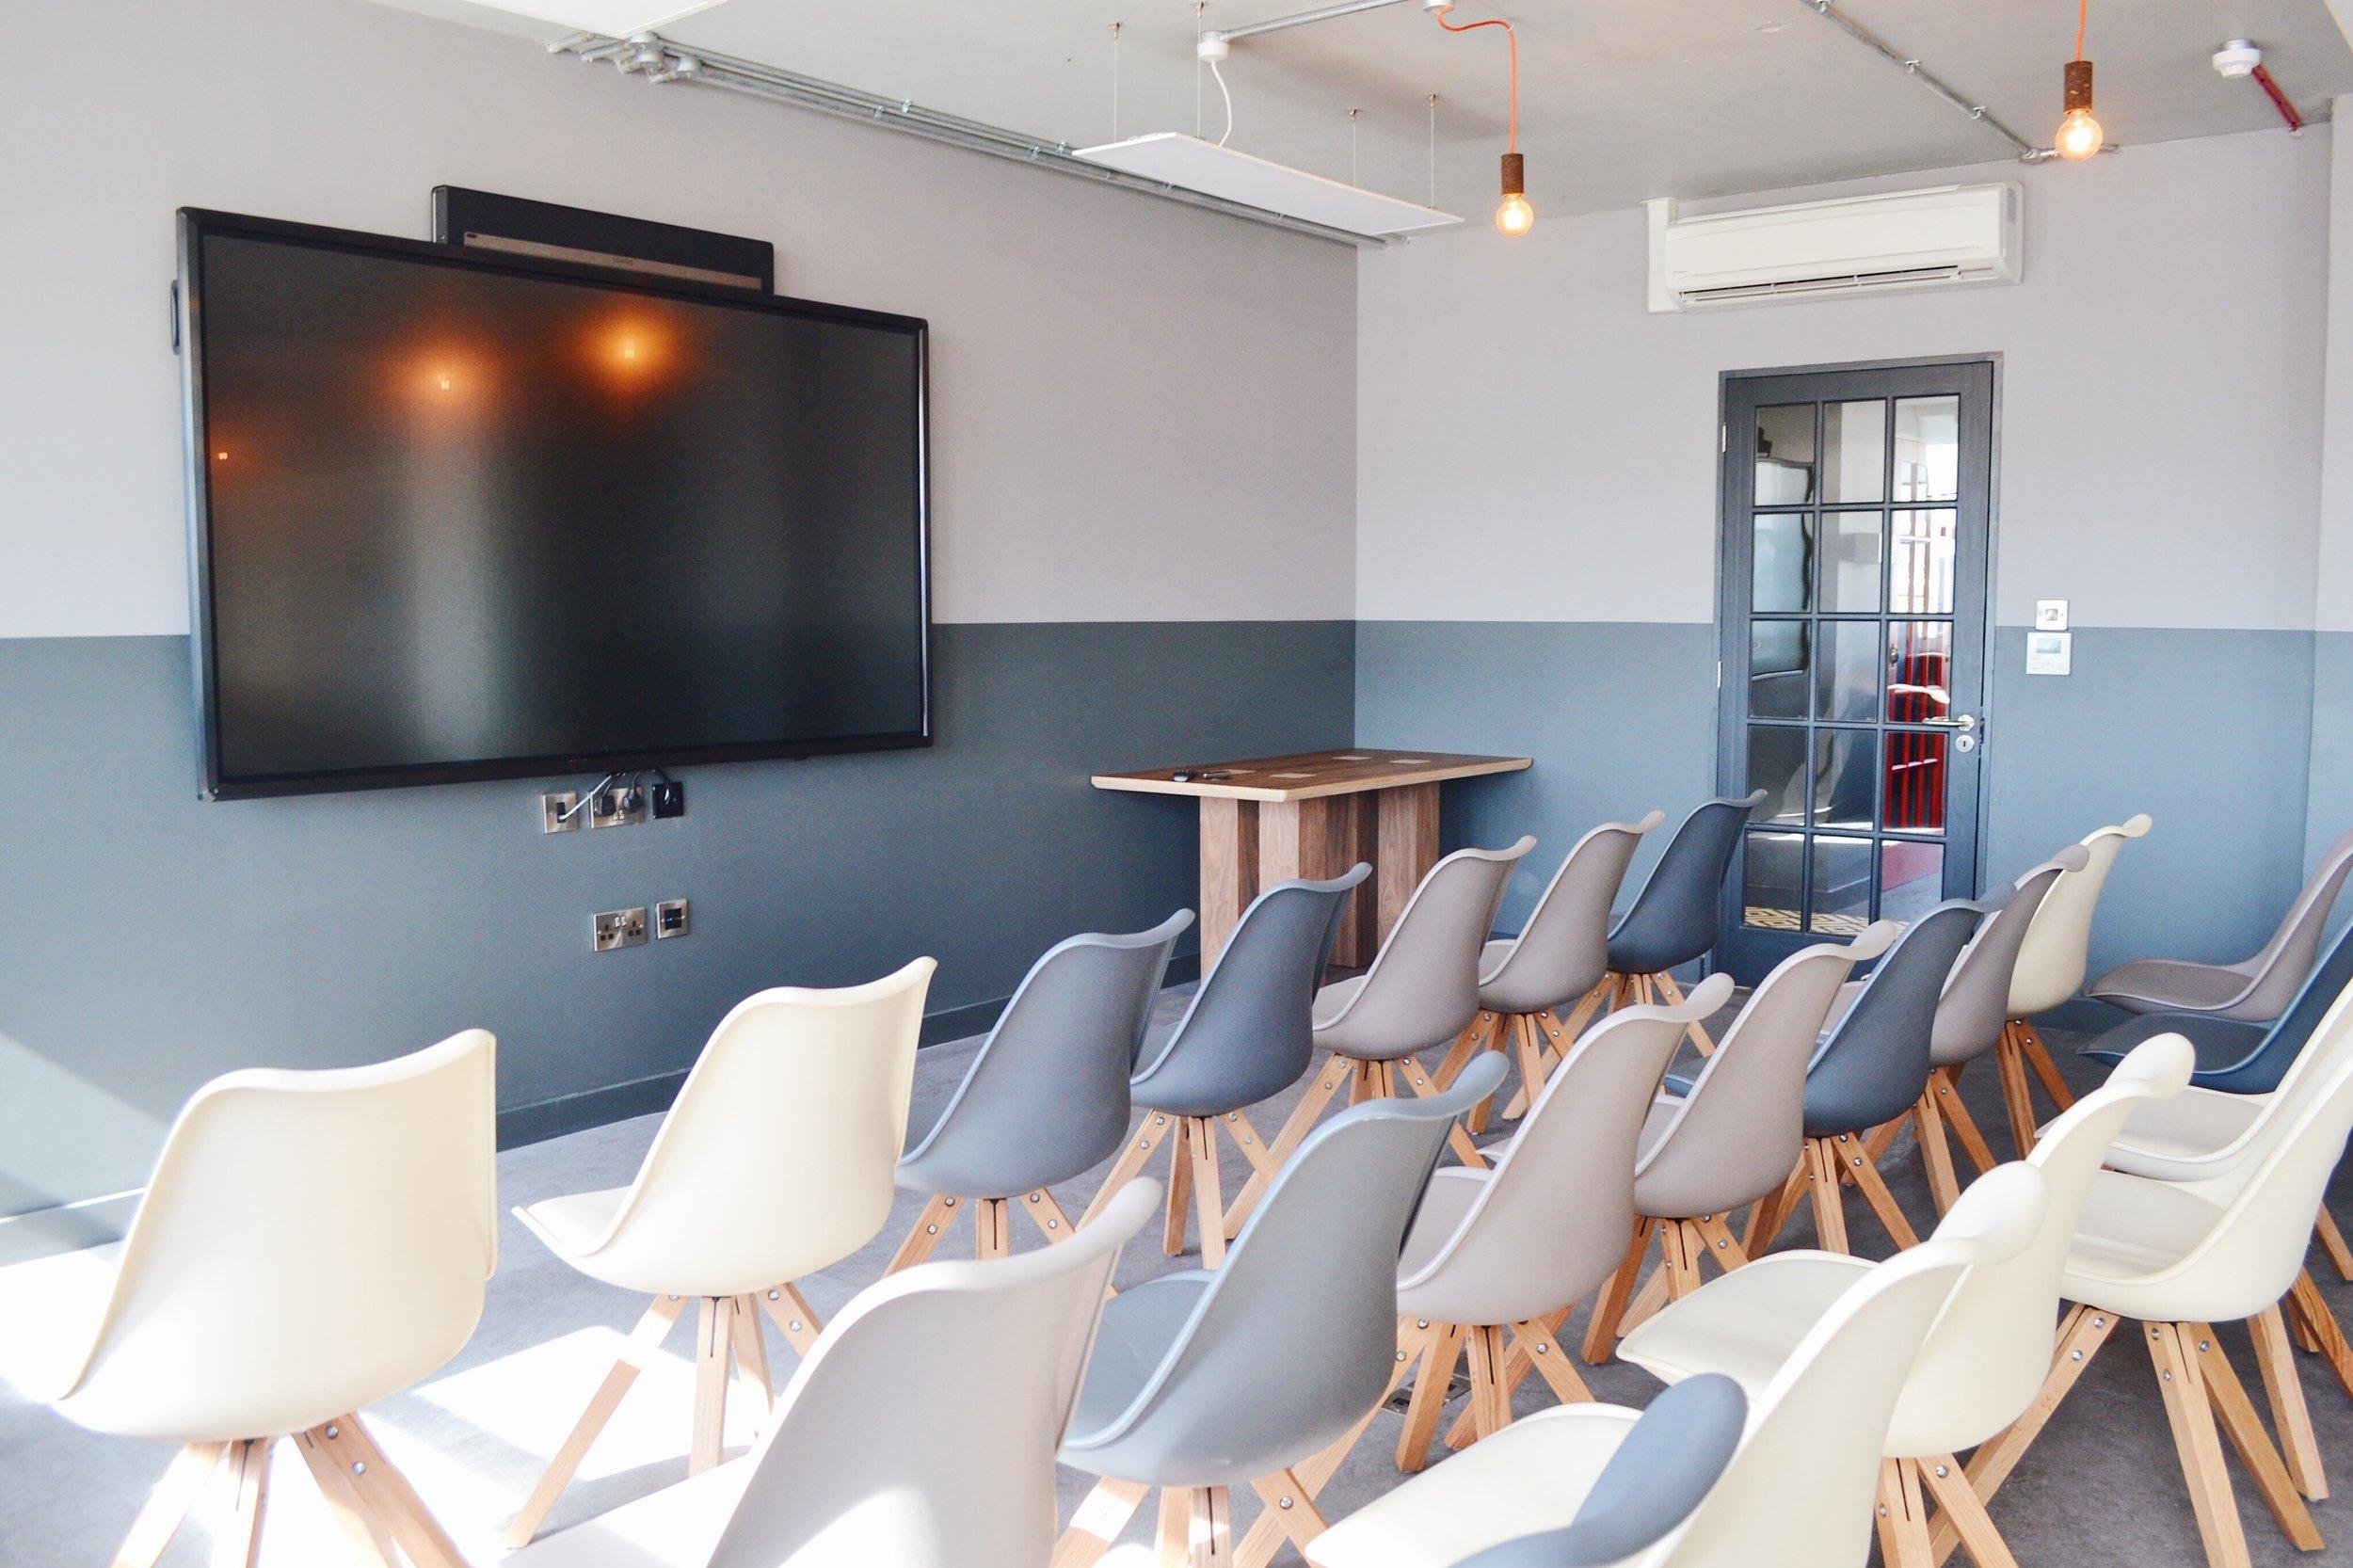 Black Meeting Room theatre style